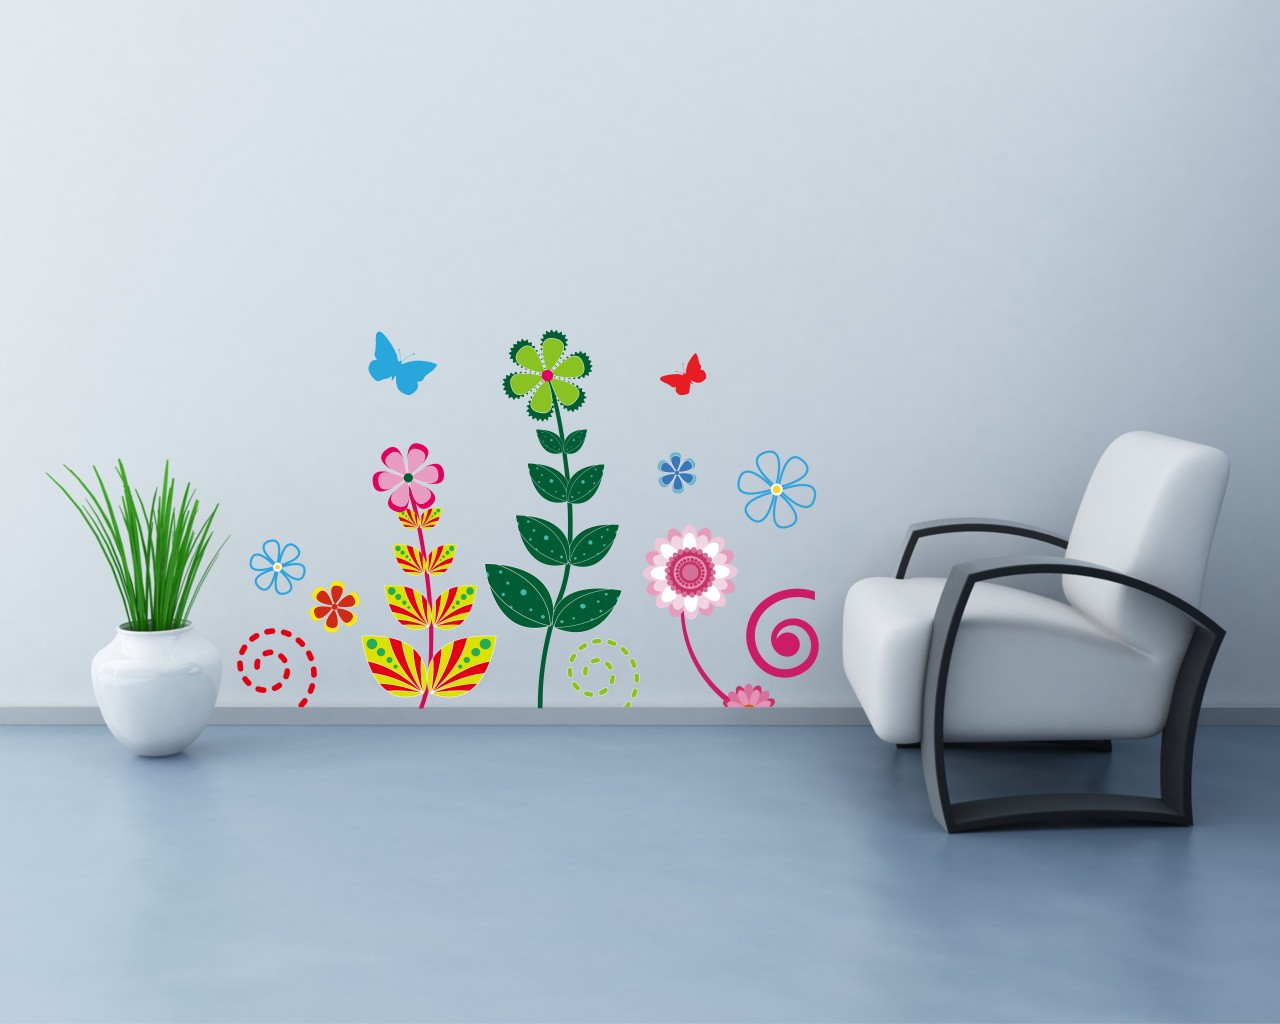 adesivo murale-fiori variopinti